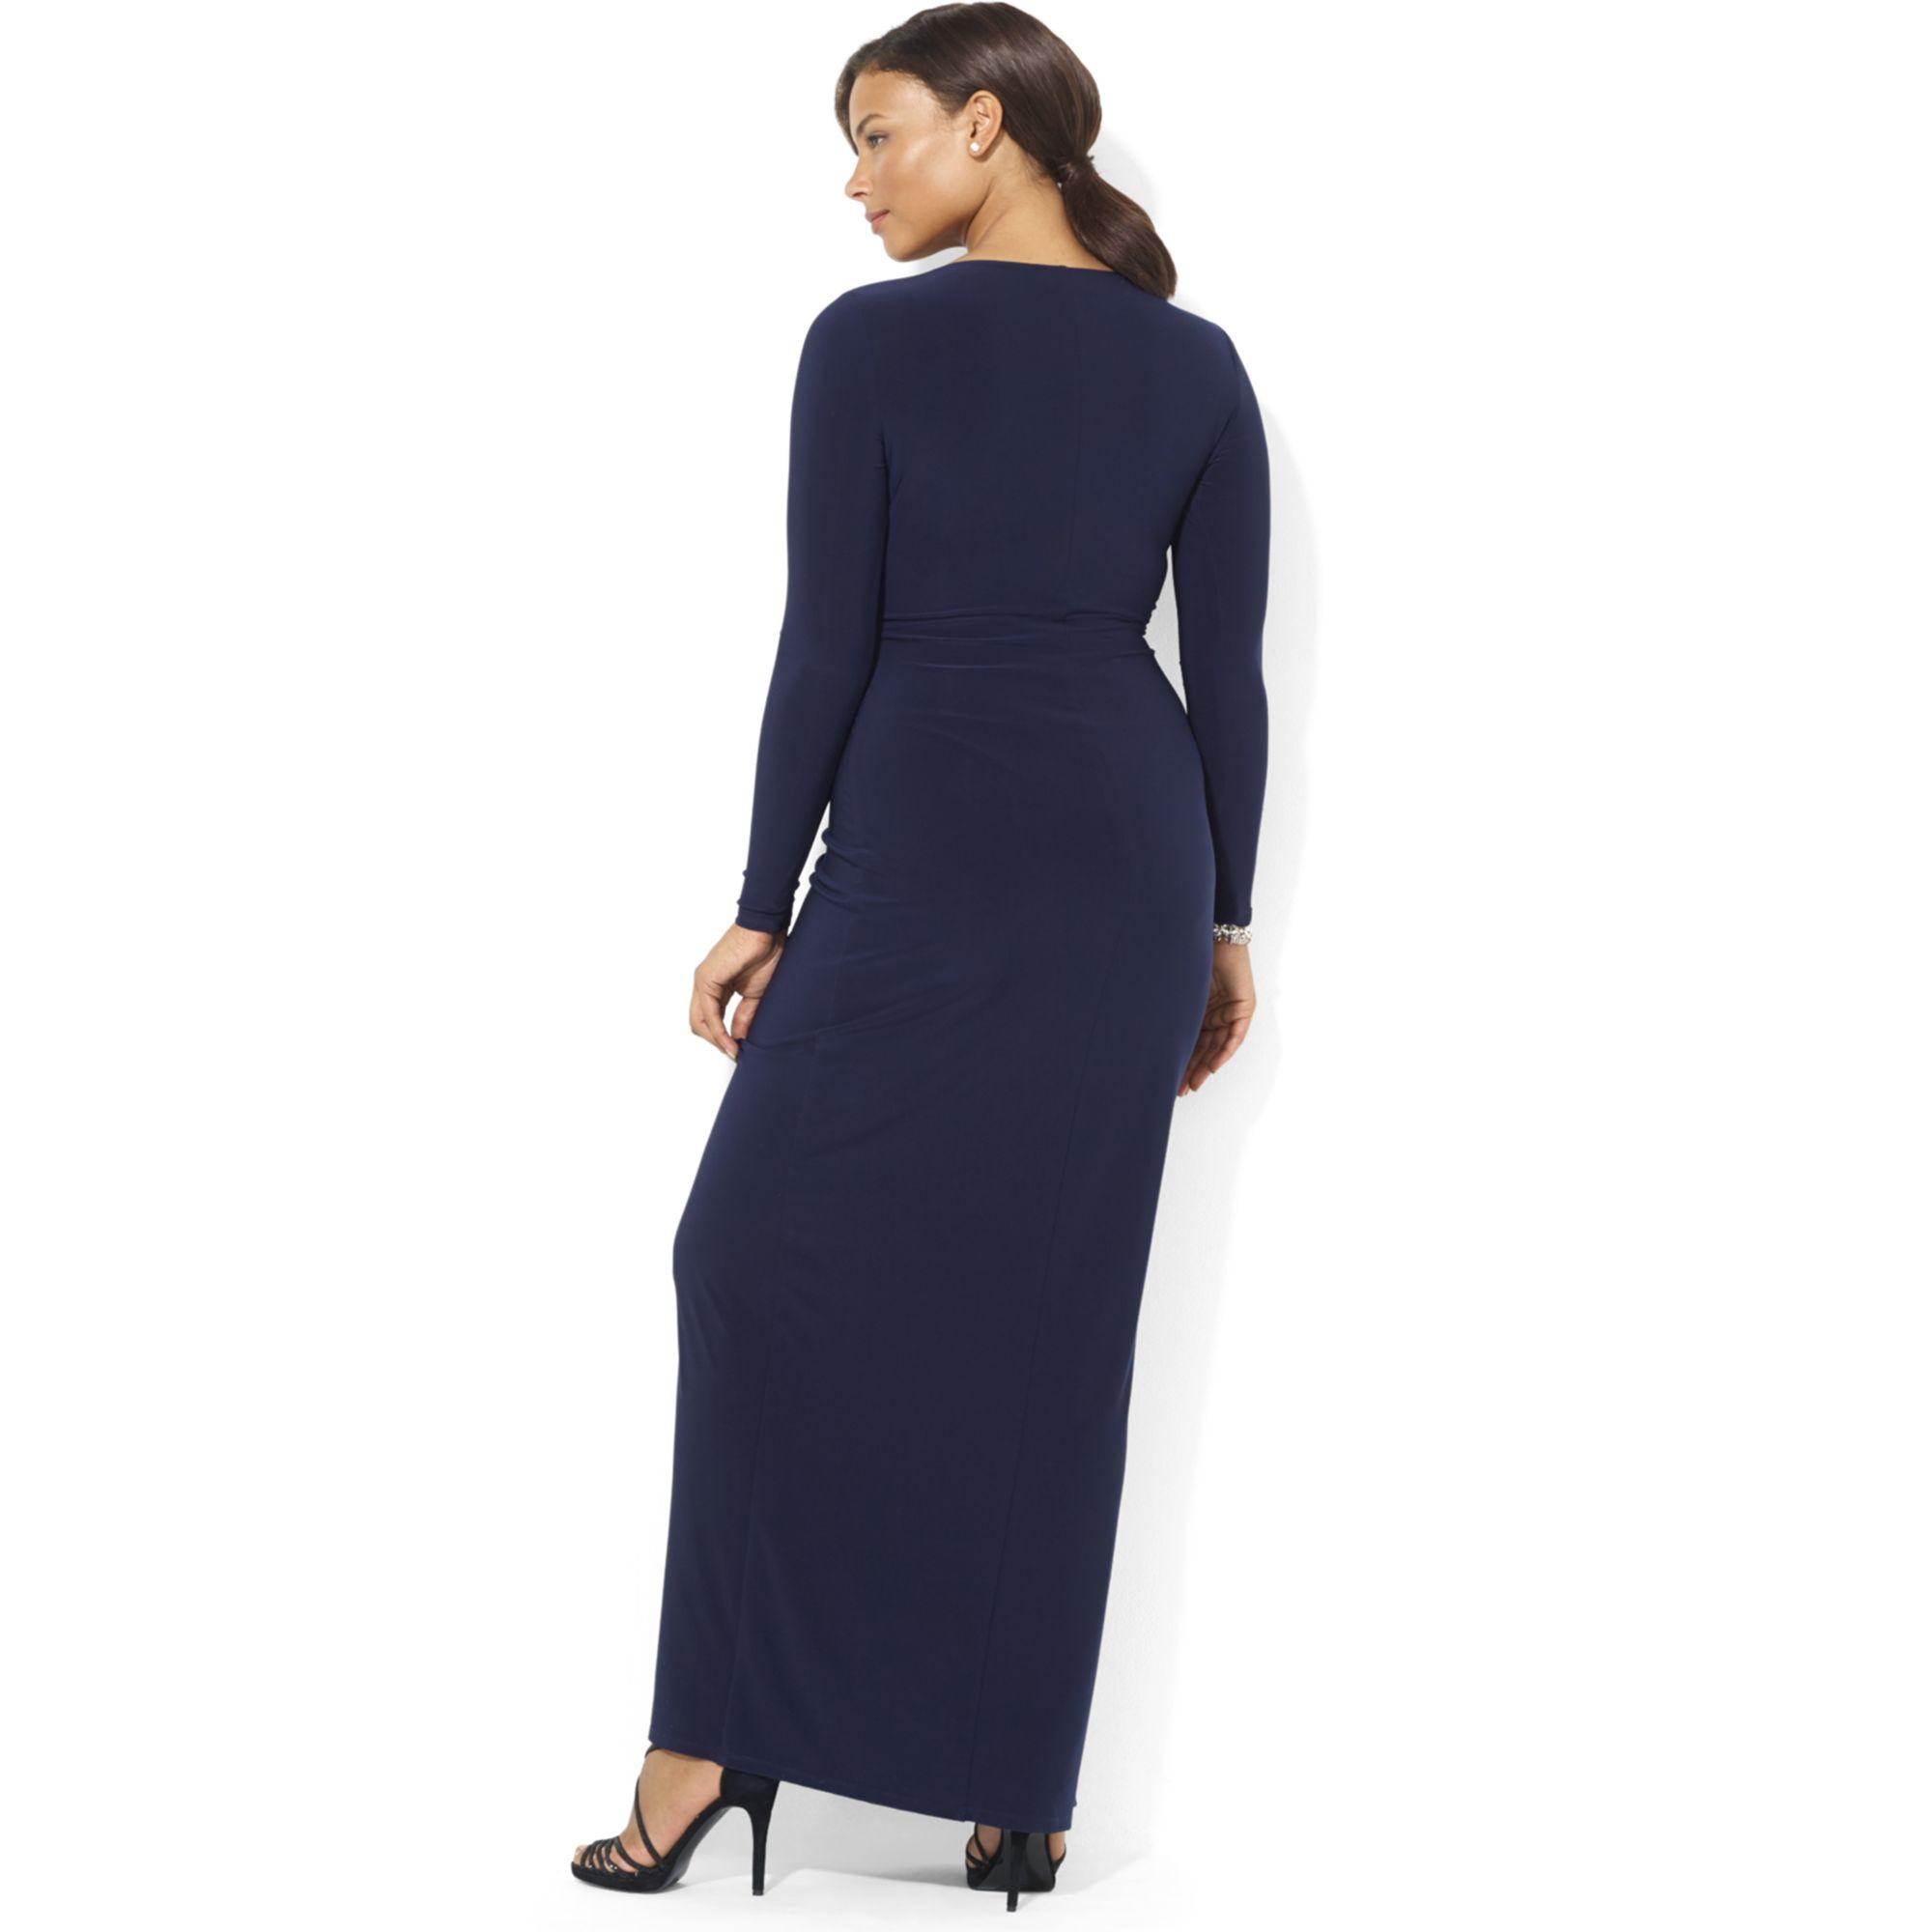 Lyst - Lauren By Ralph Lauren Long-sleeve Jersey Gown with Brooch in ...